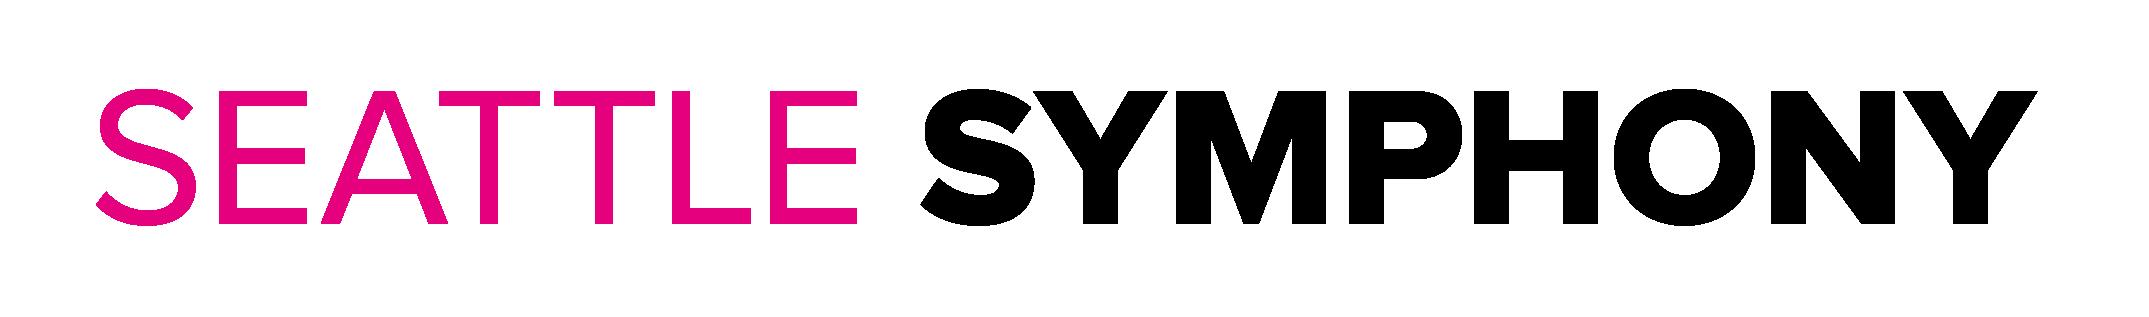 SeattleSymphony_Logo_PinkandBlack.png